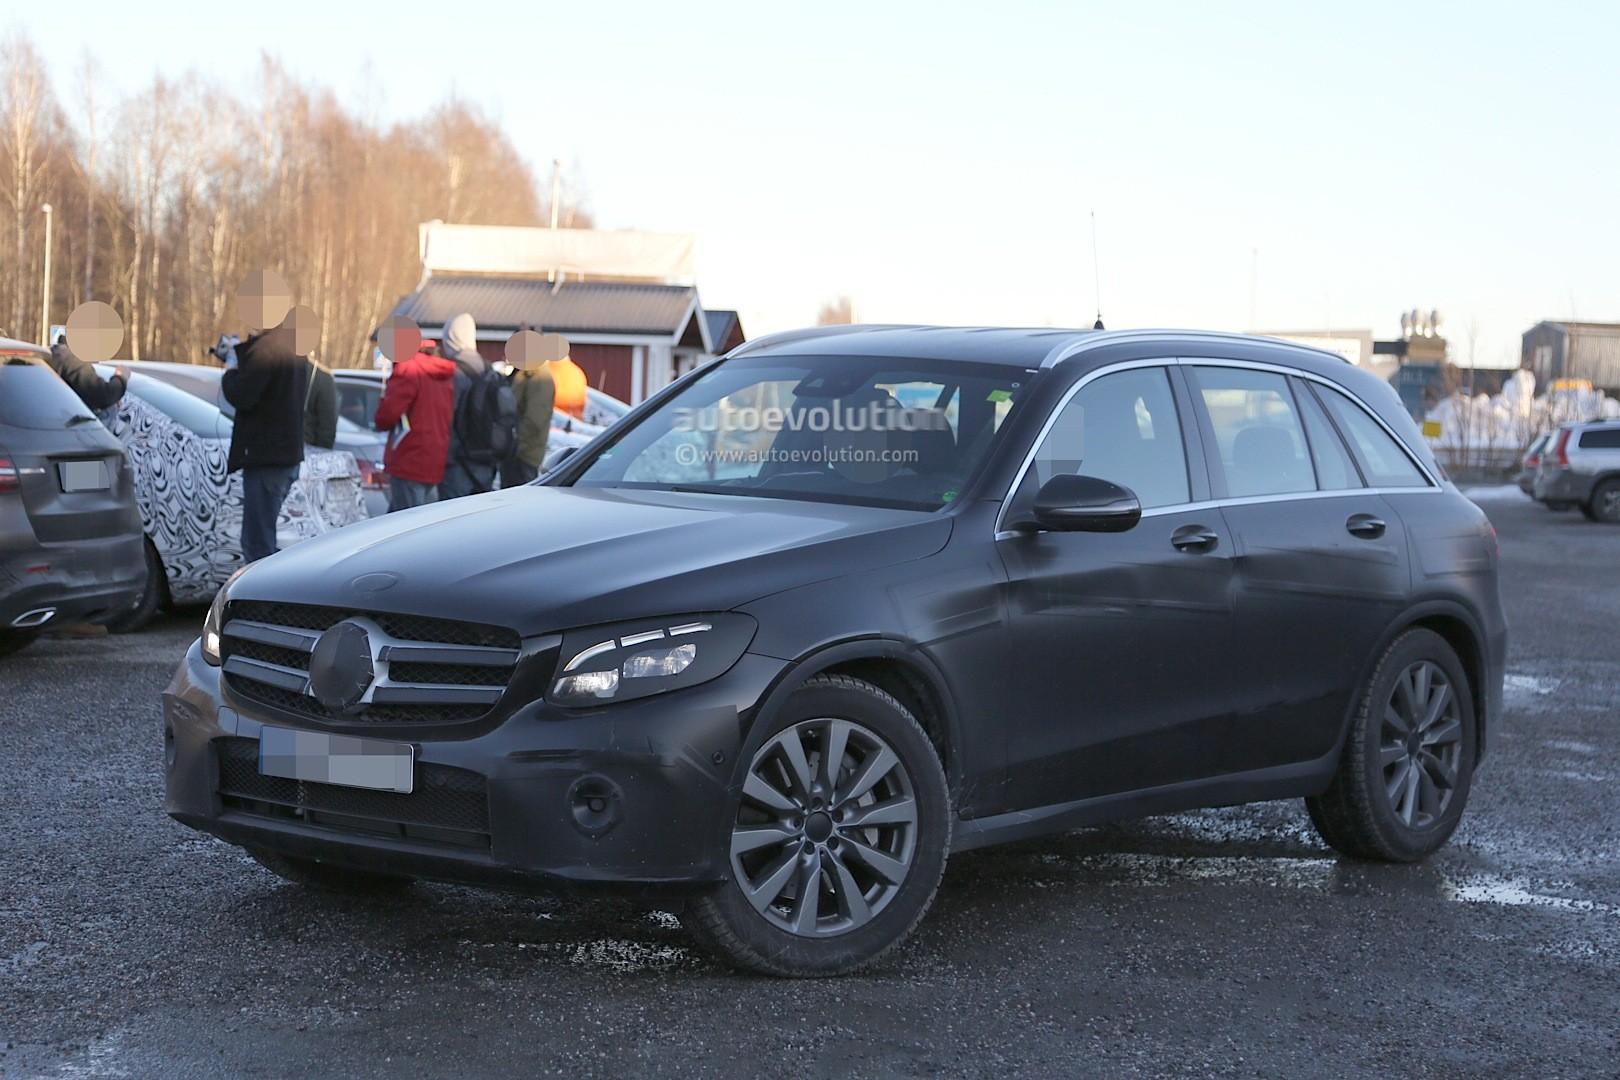 2015 - [Mercedes] GLC (GLK II) [X205] - Page 10 2016-mercedes-glc-spy-photos-show-nearly-undisguised-pre-production-prototypes_3